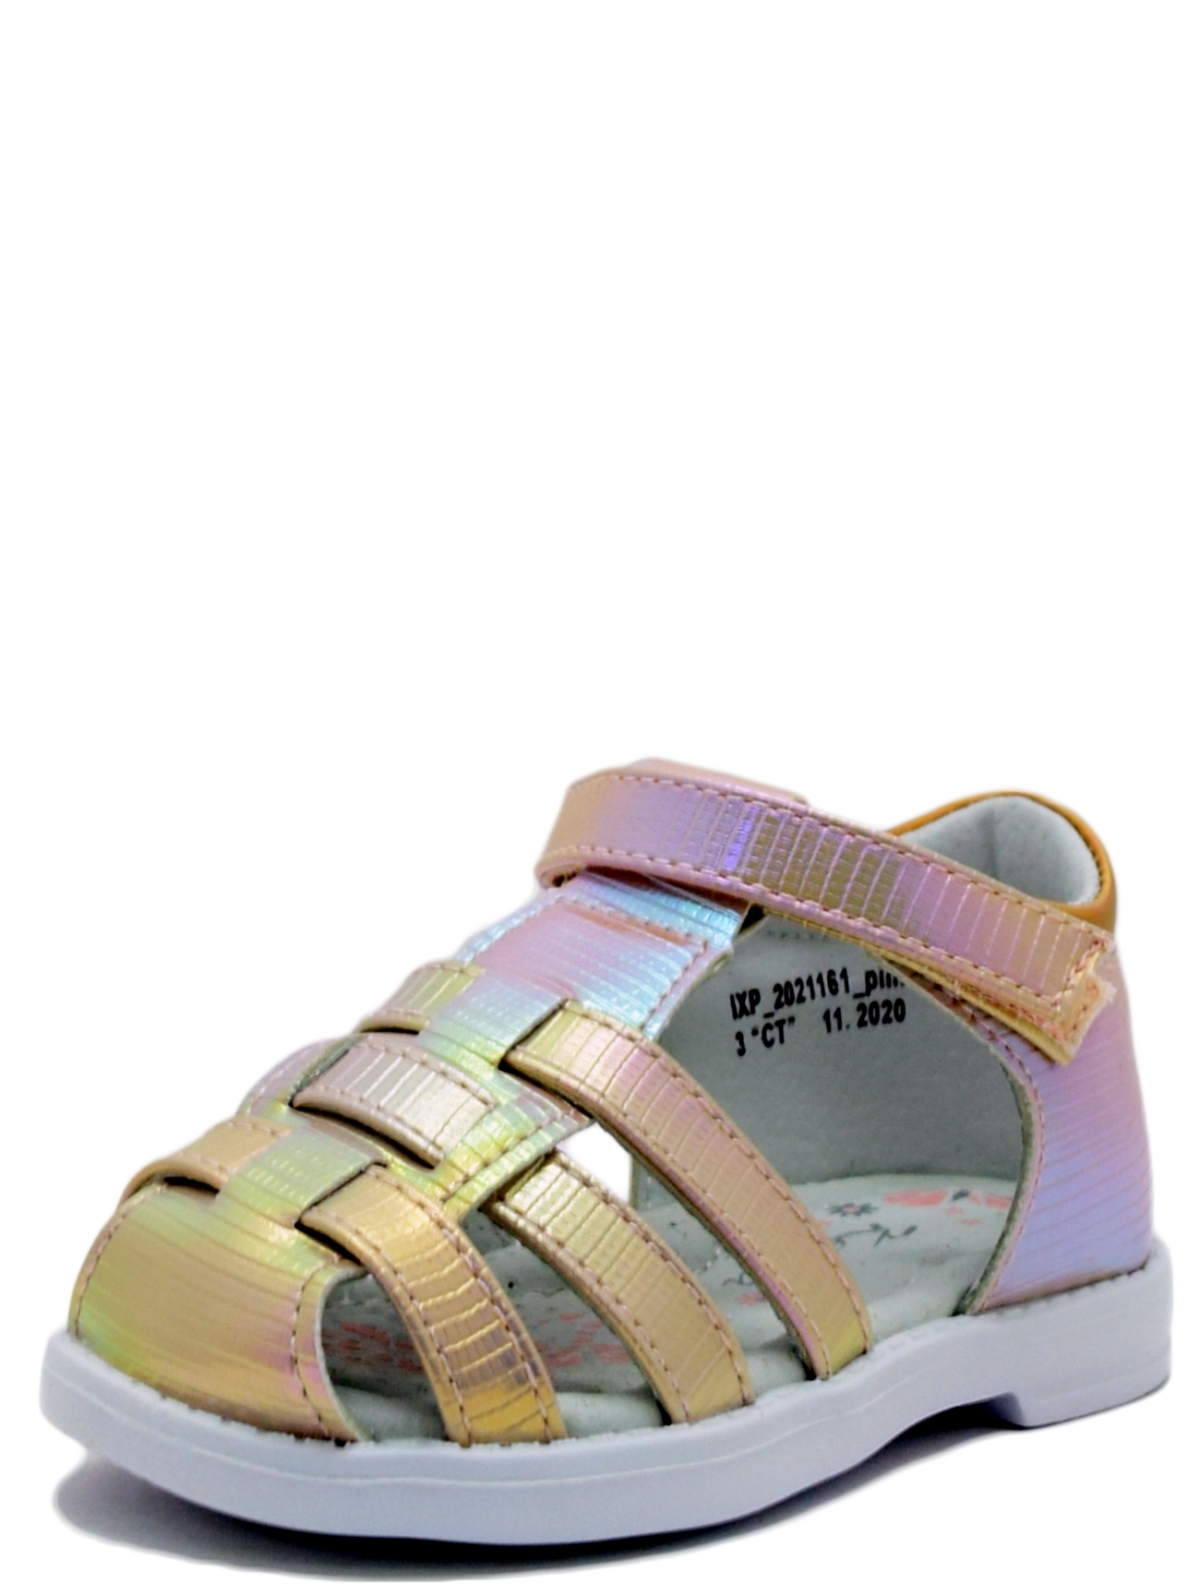 Kenka IXP-2021161 детские кроссовки